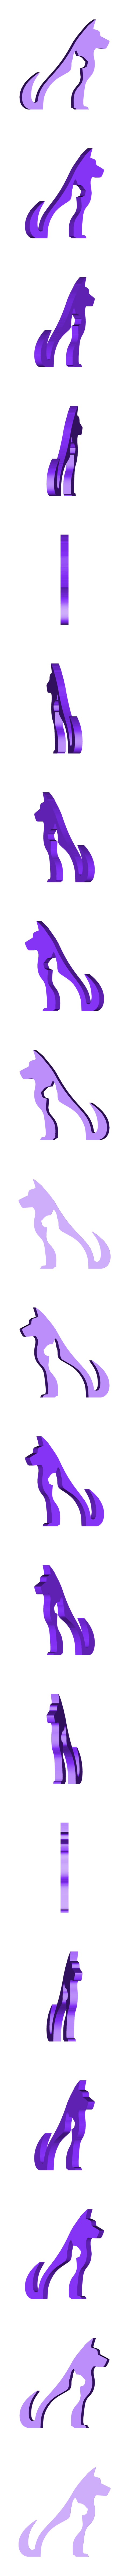 hund_katz_hase_maus_hu.STL Download free STL file Animal Silhouette - Dog Cat Rabbit Mouse • 3D printing template, jtronics